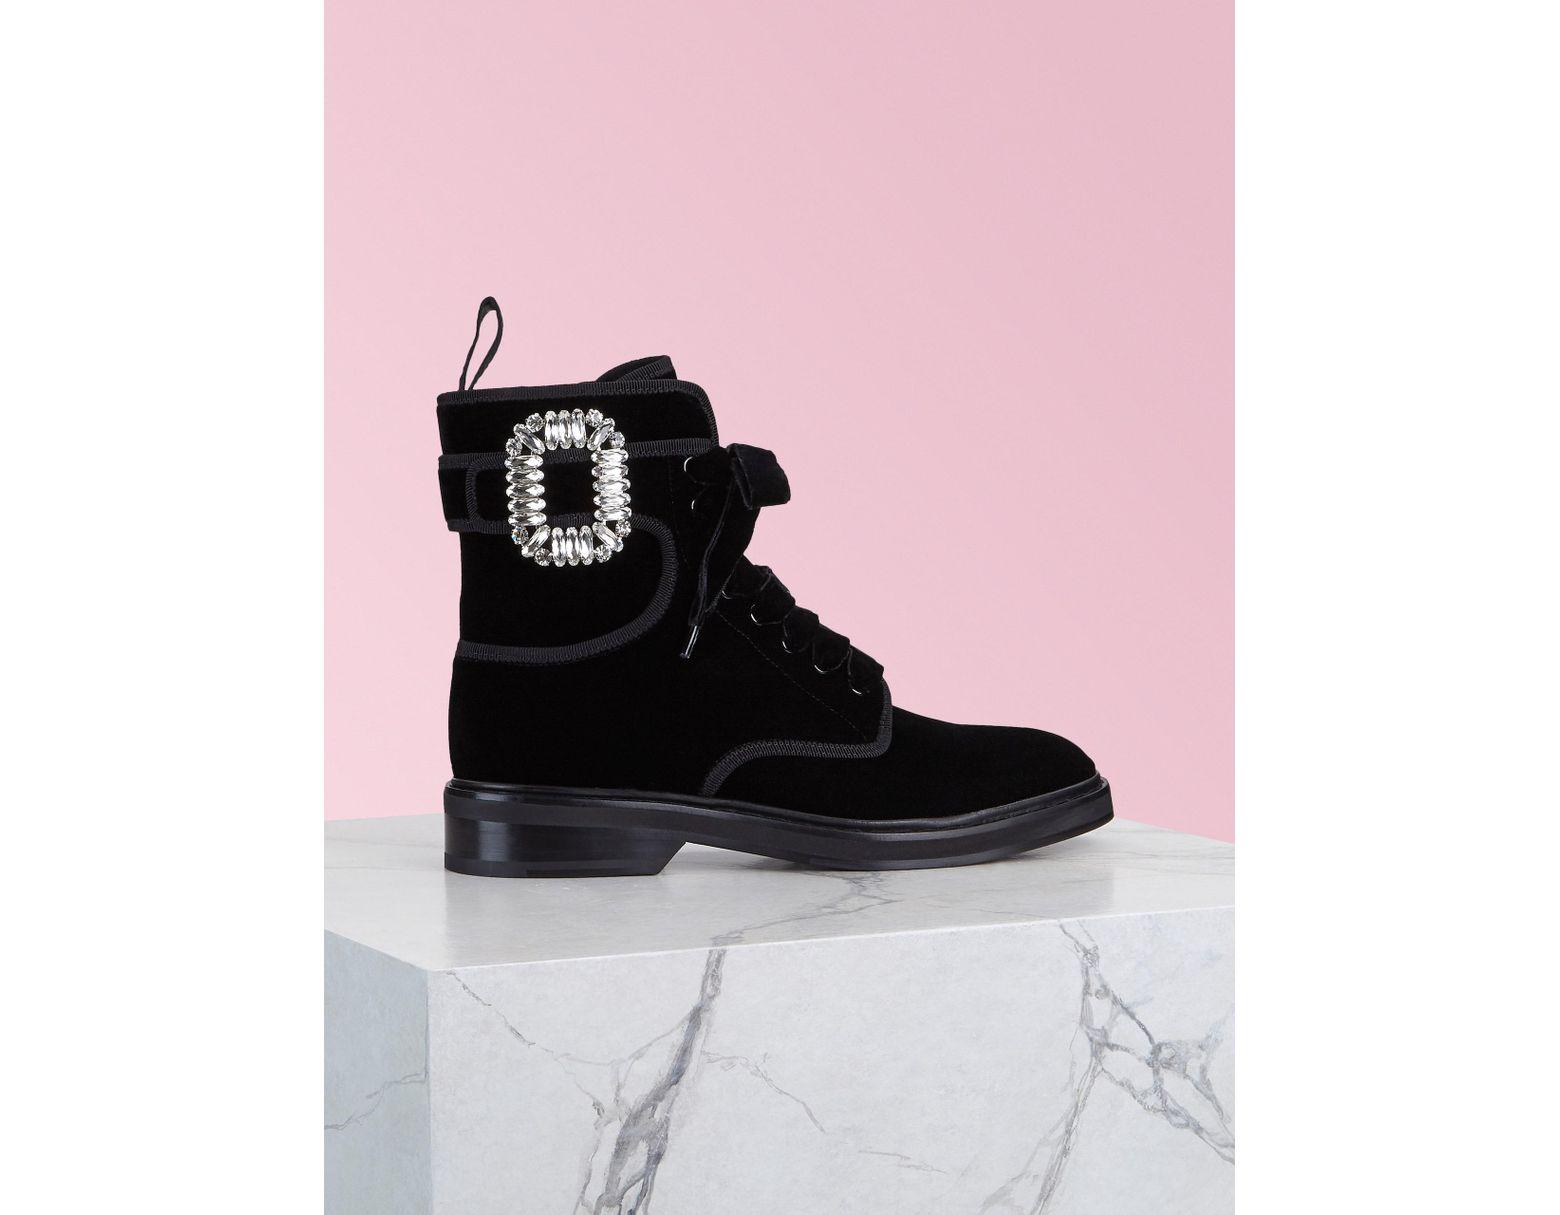 97ea7a33b84 Women's Black Viv' Rangers Strass Buckle Fabric Ankle Boots